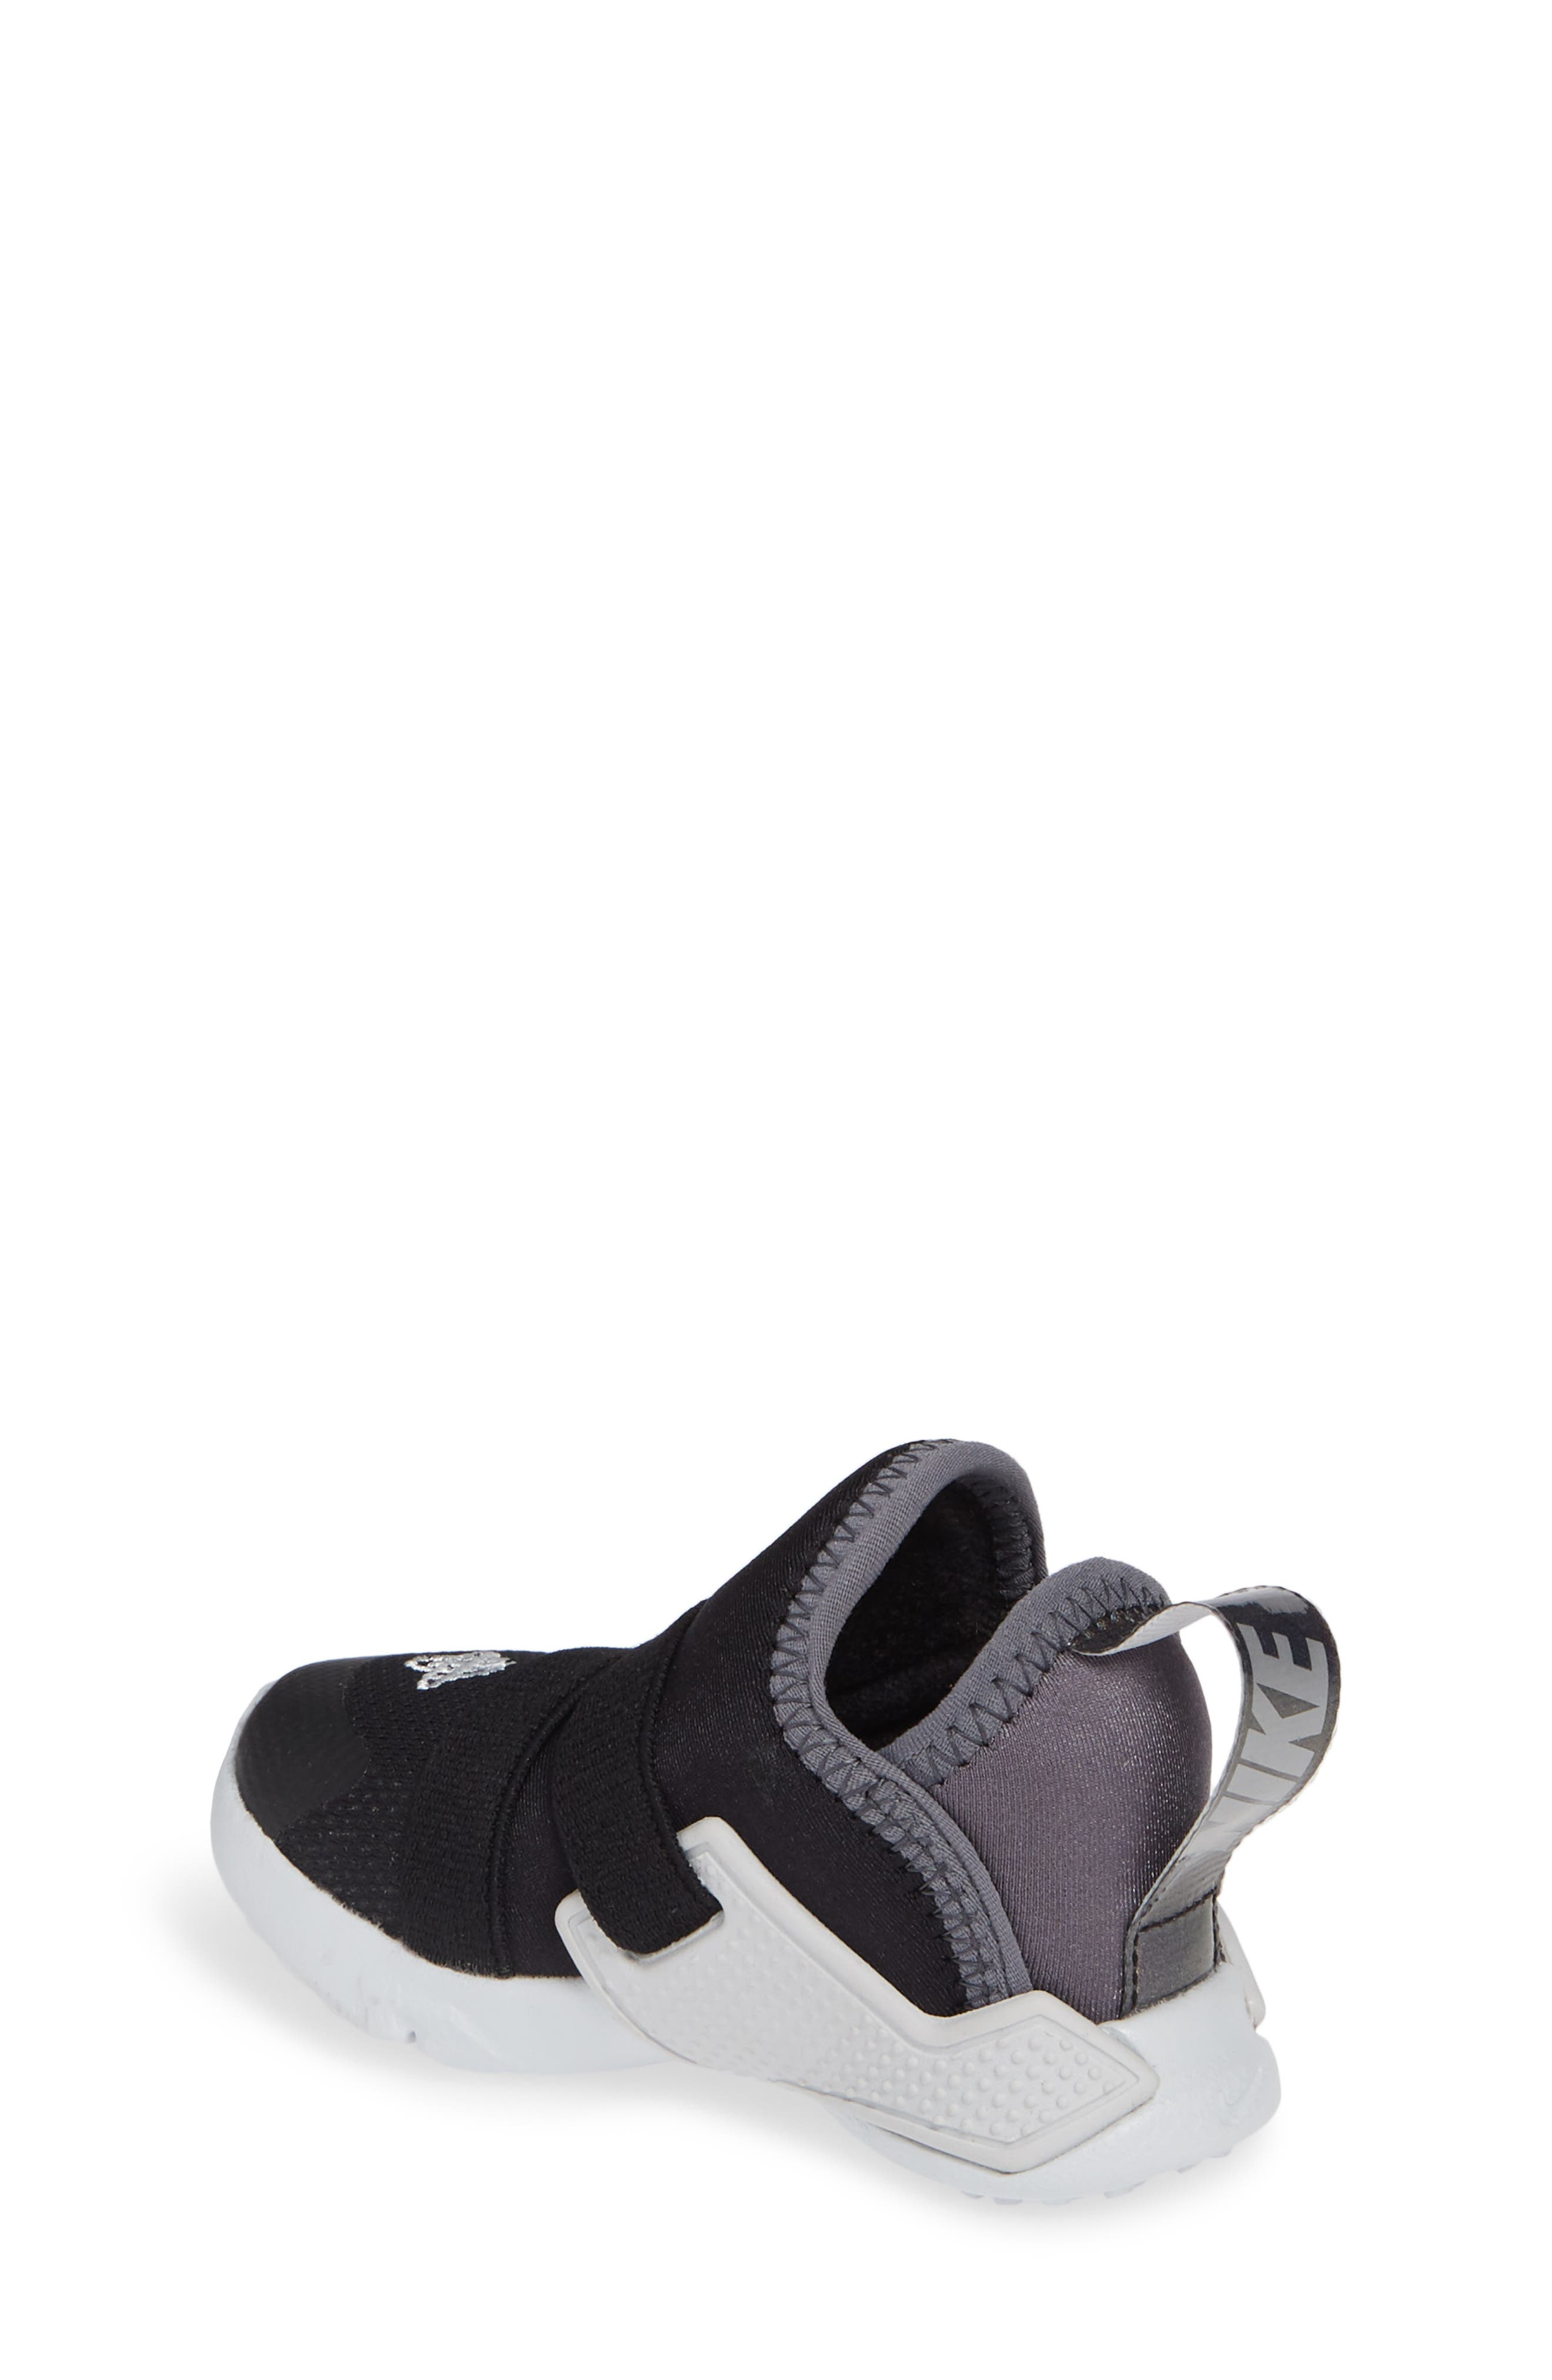 NIKE, Huarache Extreme Sneaker, Alternate thumbnail 2, color, BLACK/ METALLIC SILVER-GREY